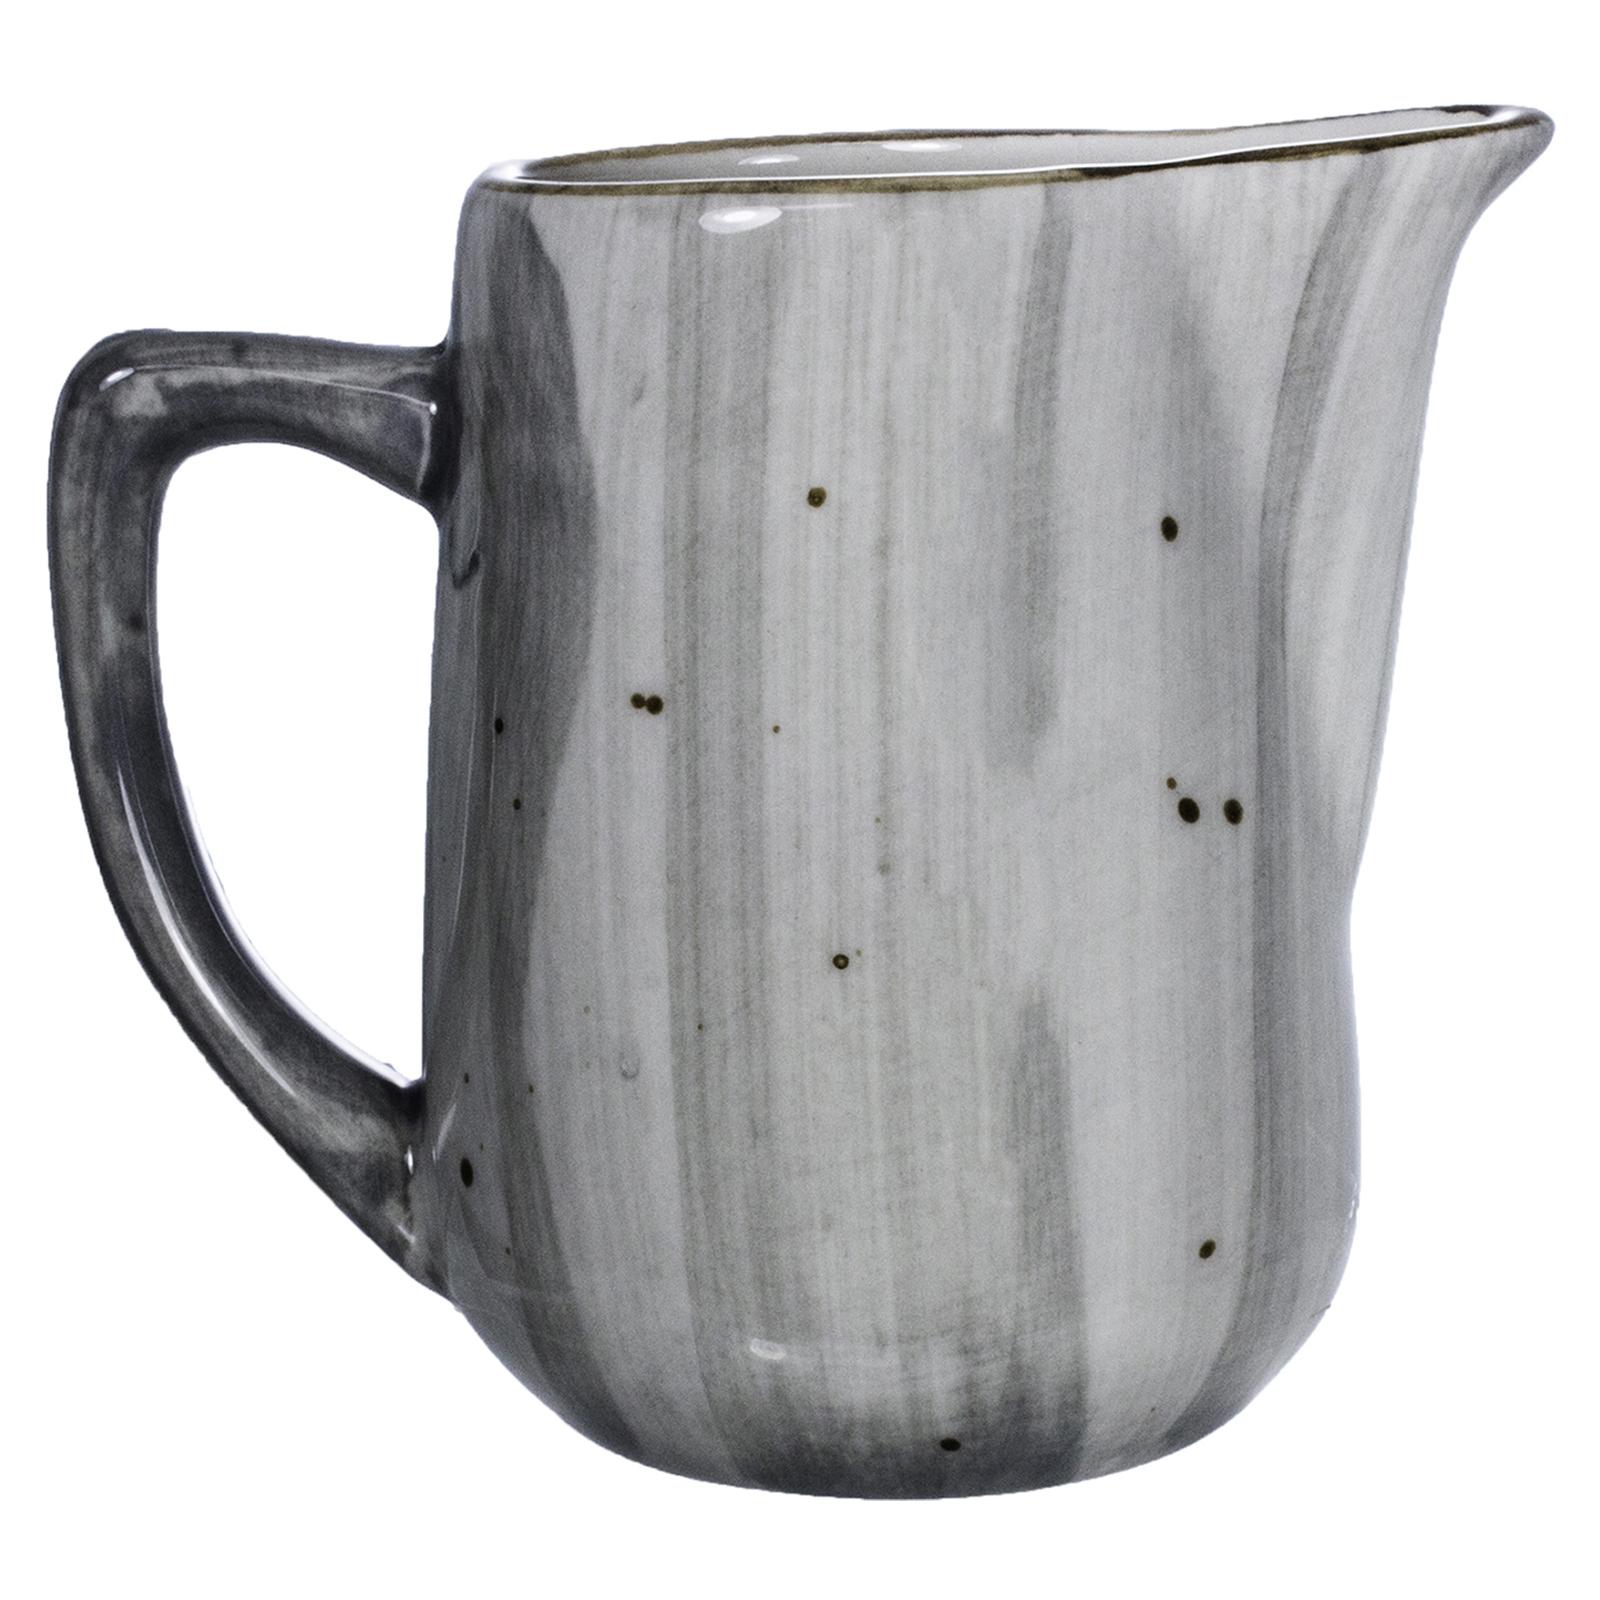 International Tableware RT-100-ST creamer / pitcher, china